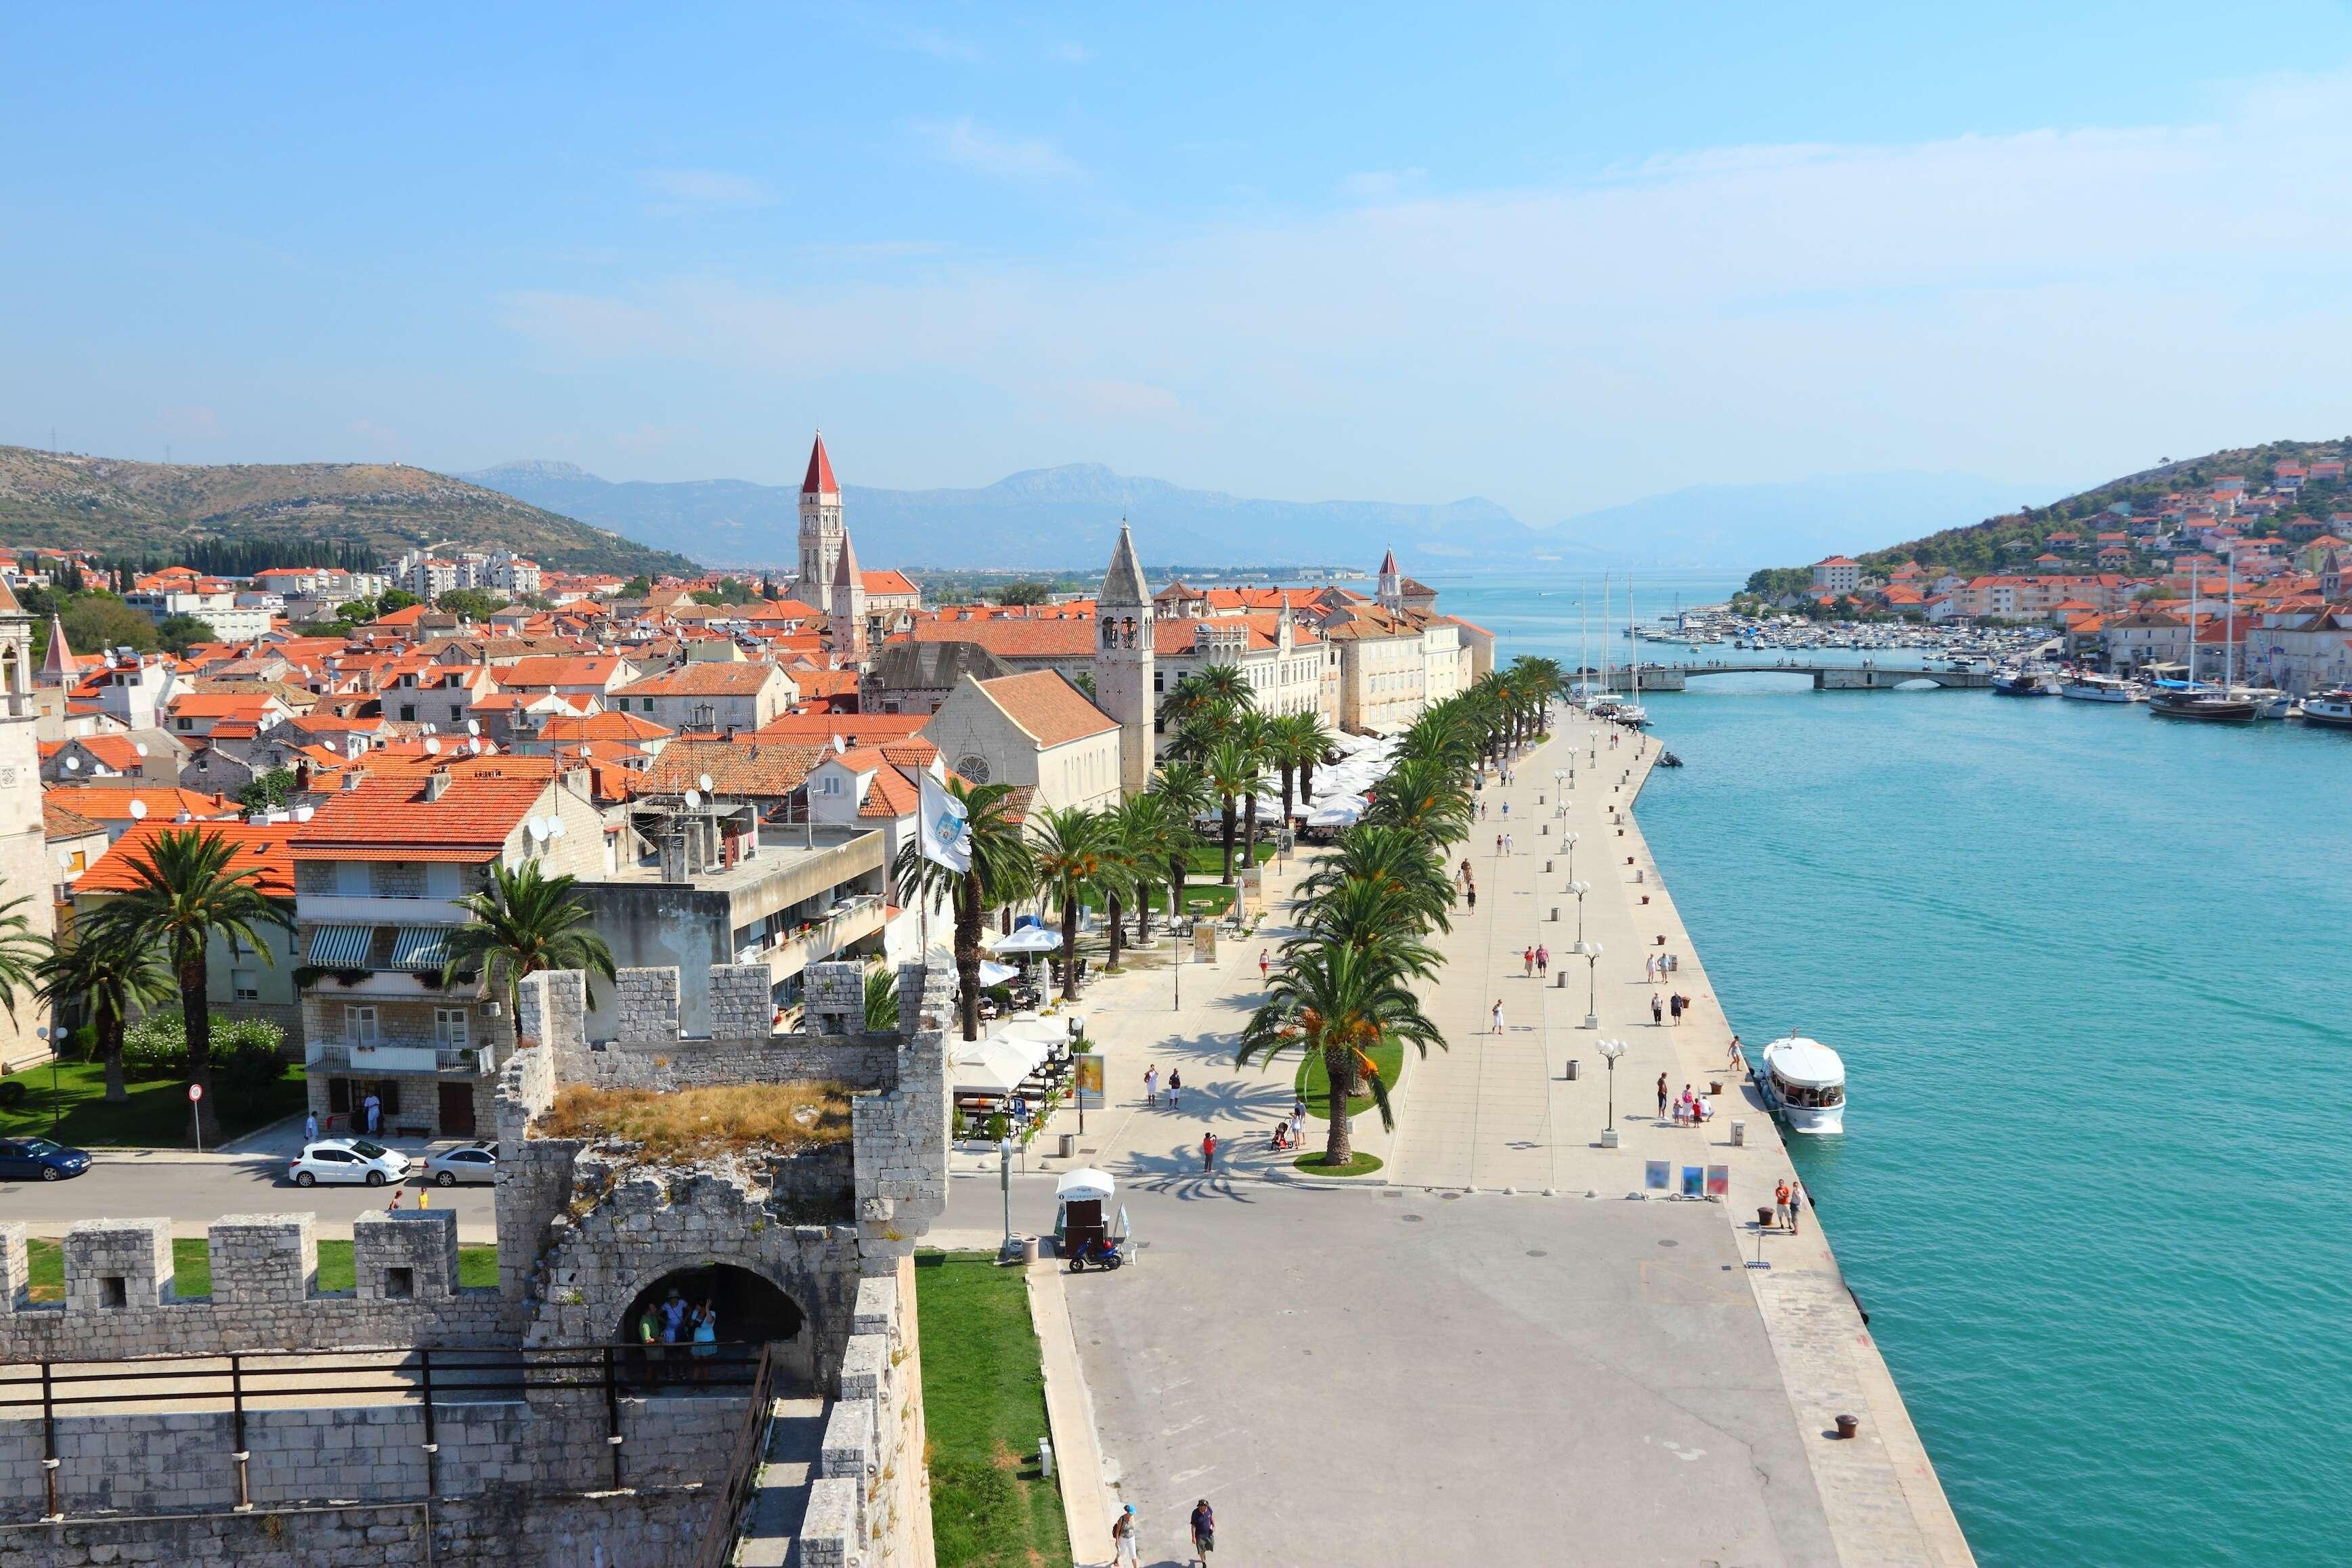 Croatia & Its Islands Small Ship Cruising on the Adriatic Coast